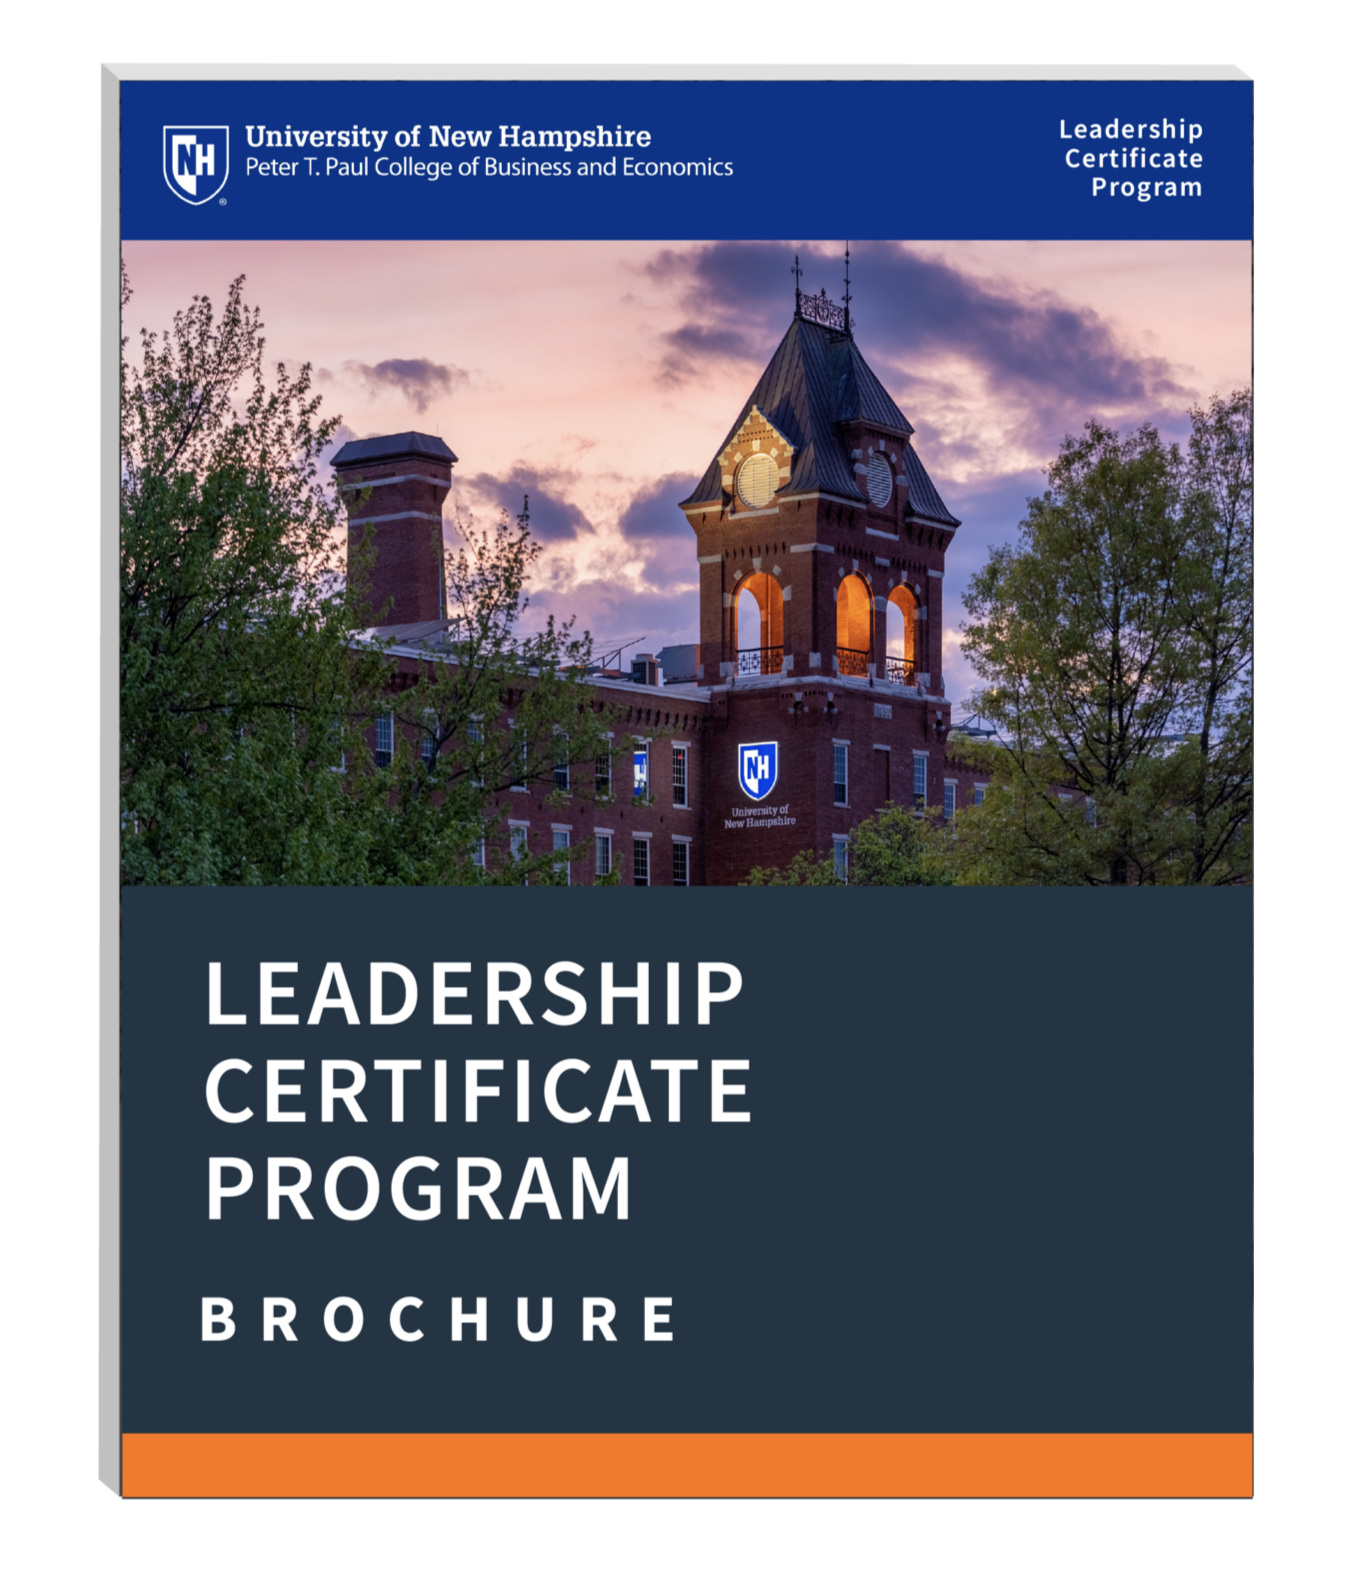 Leadership Certificate Program Brochure